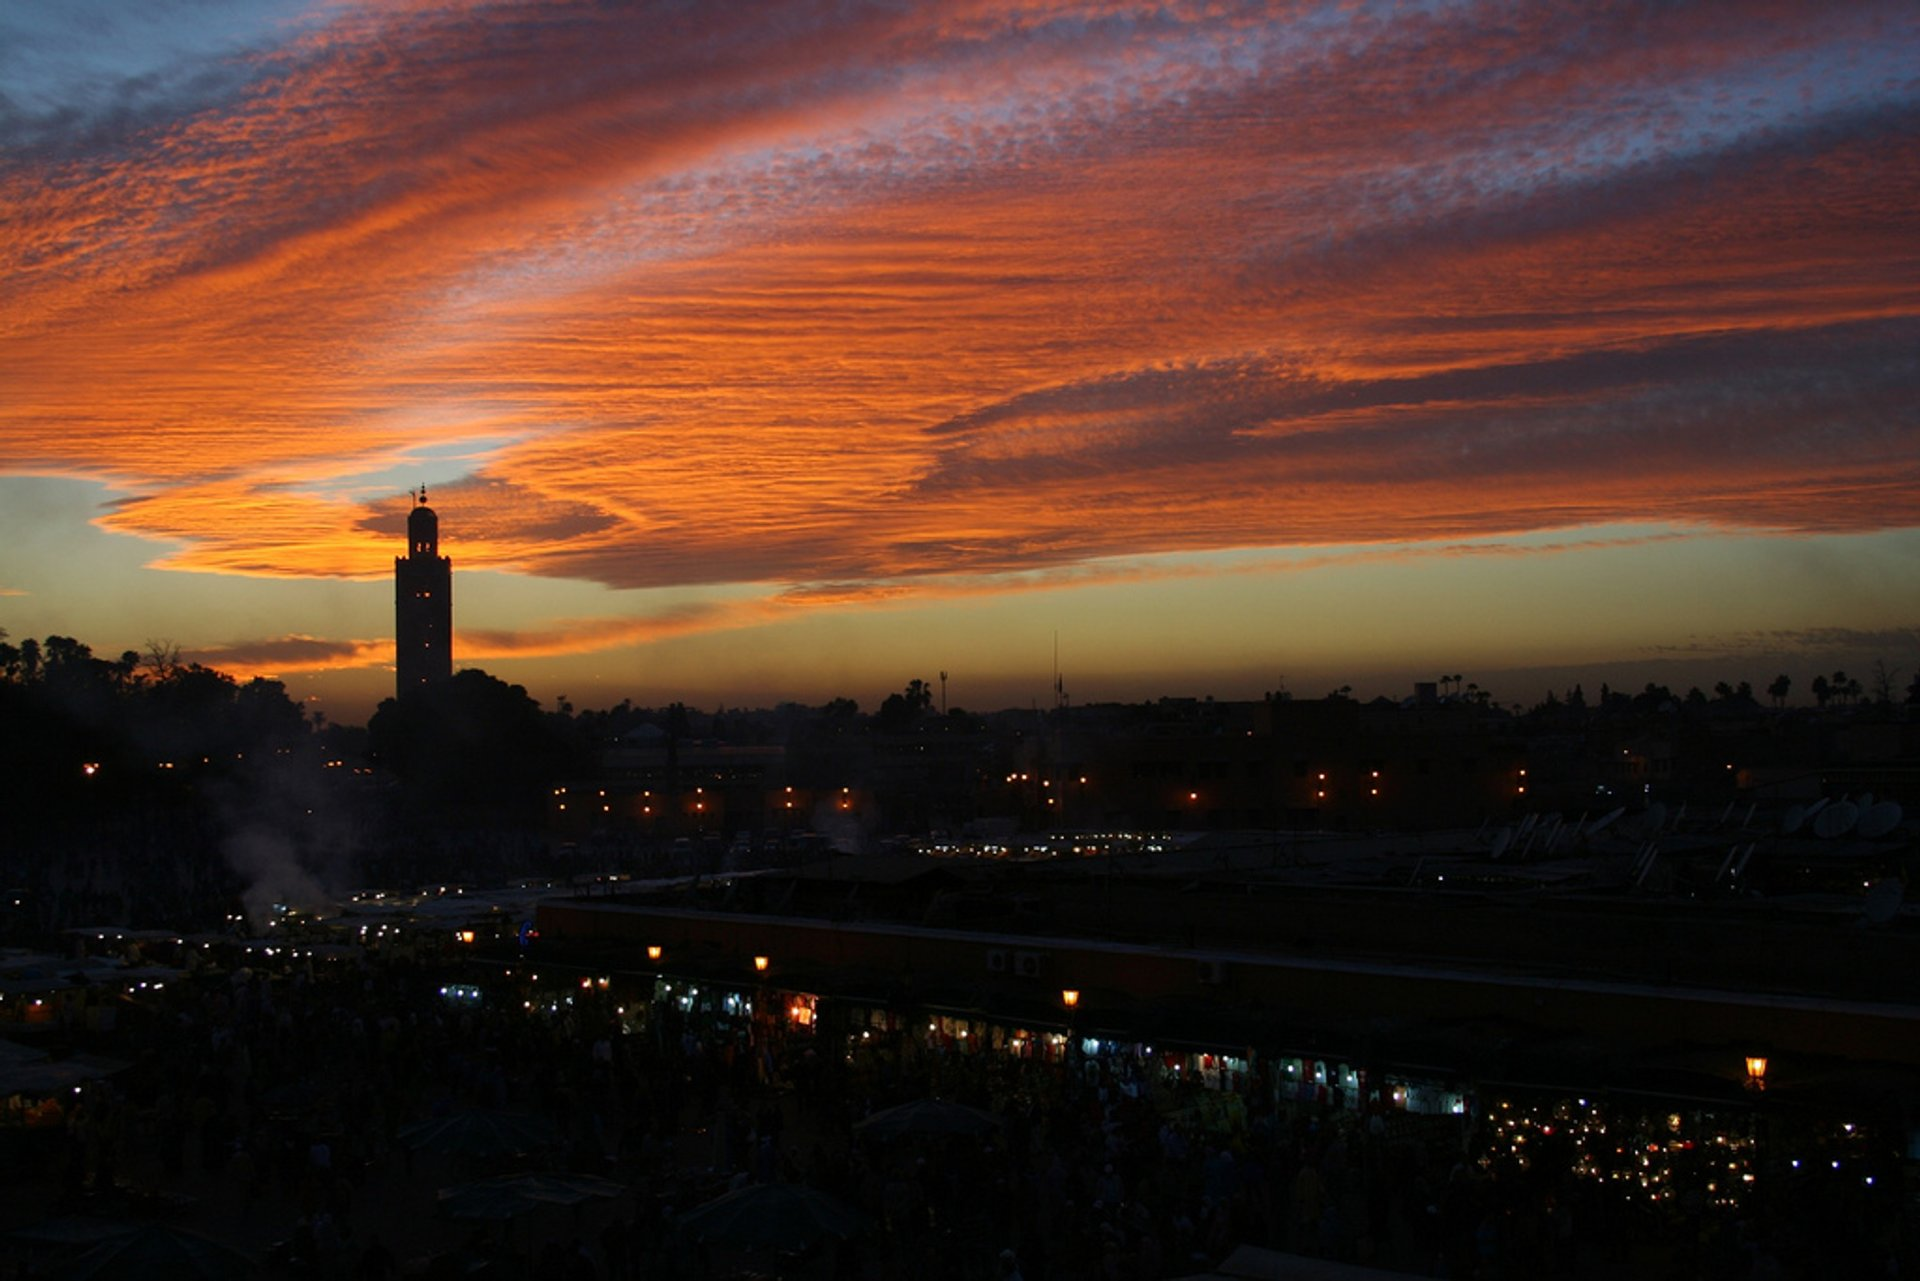 Sunset in Marrakesh 2020